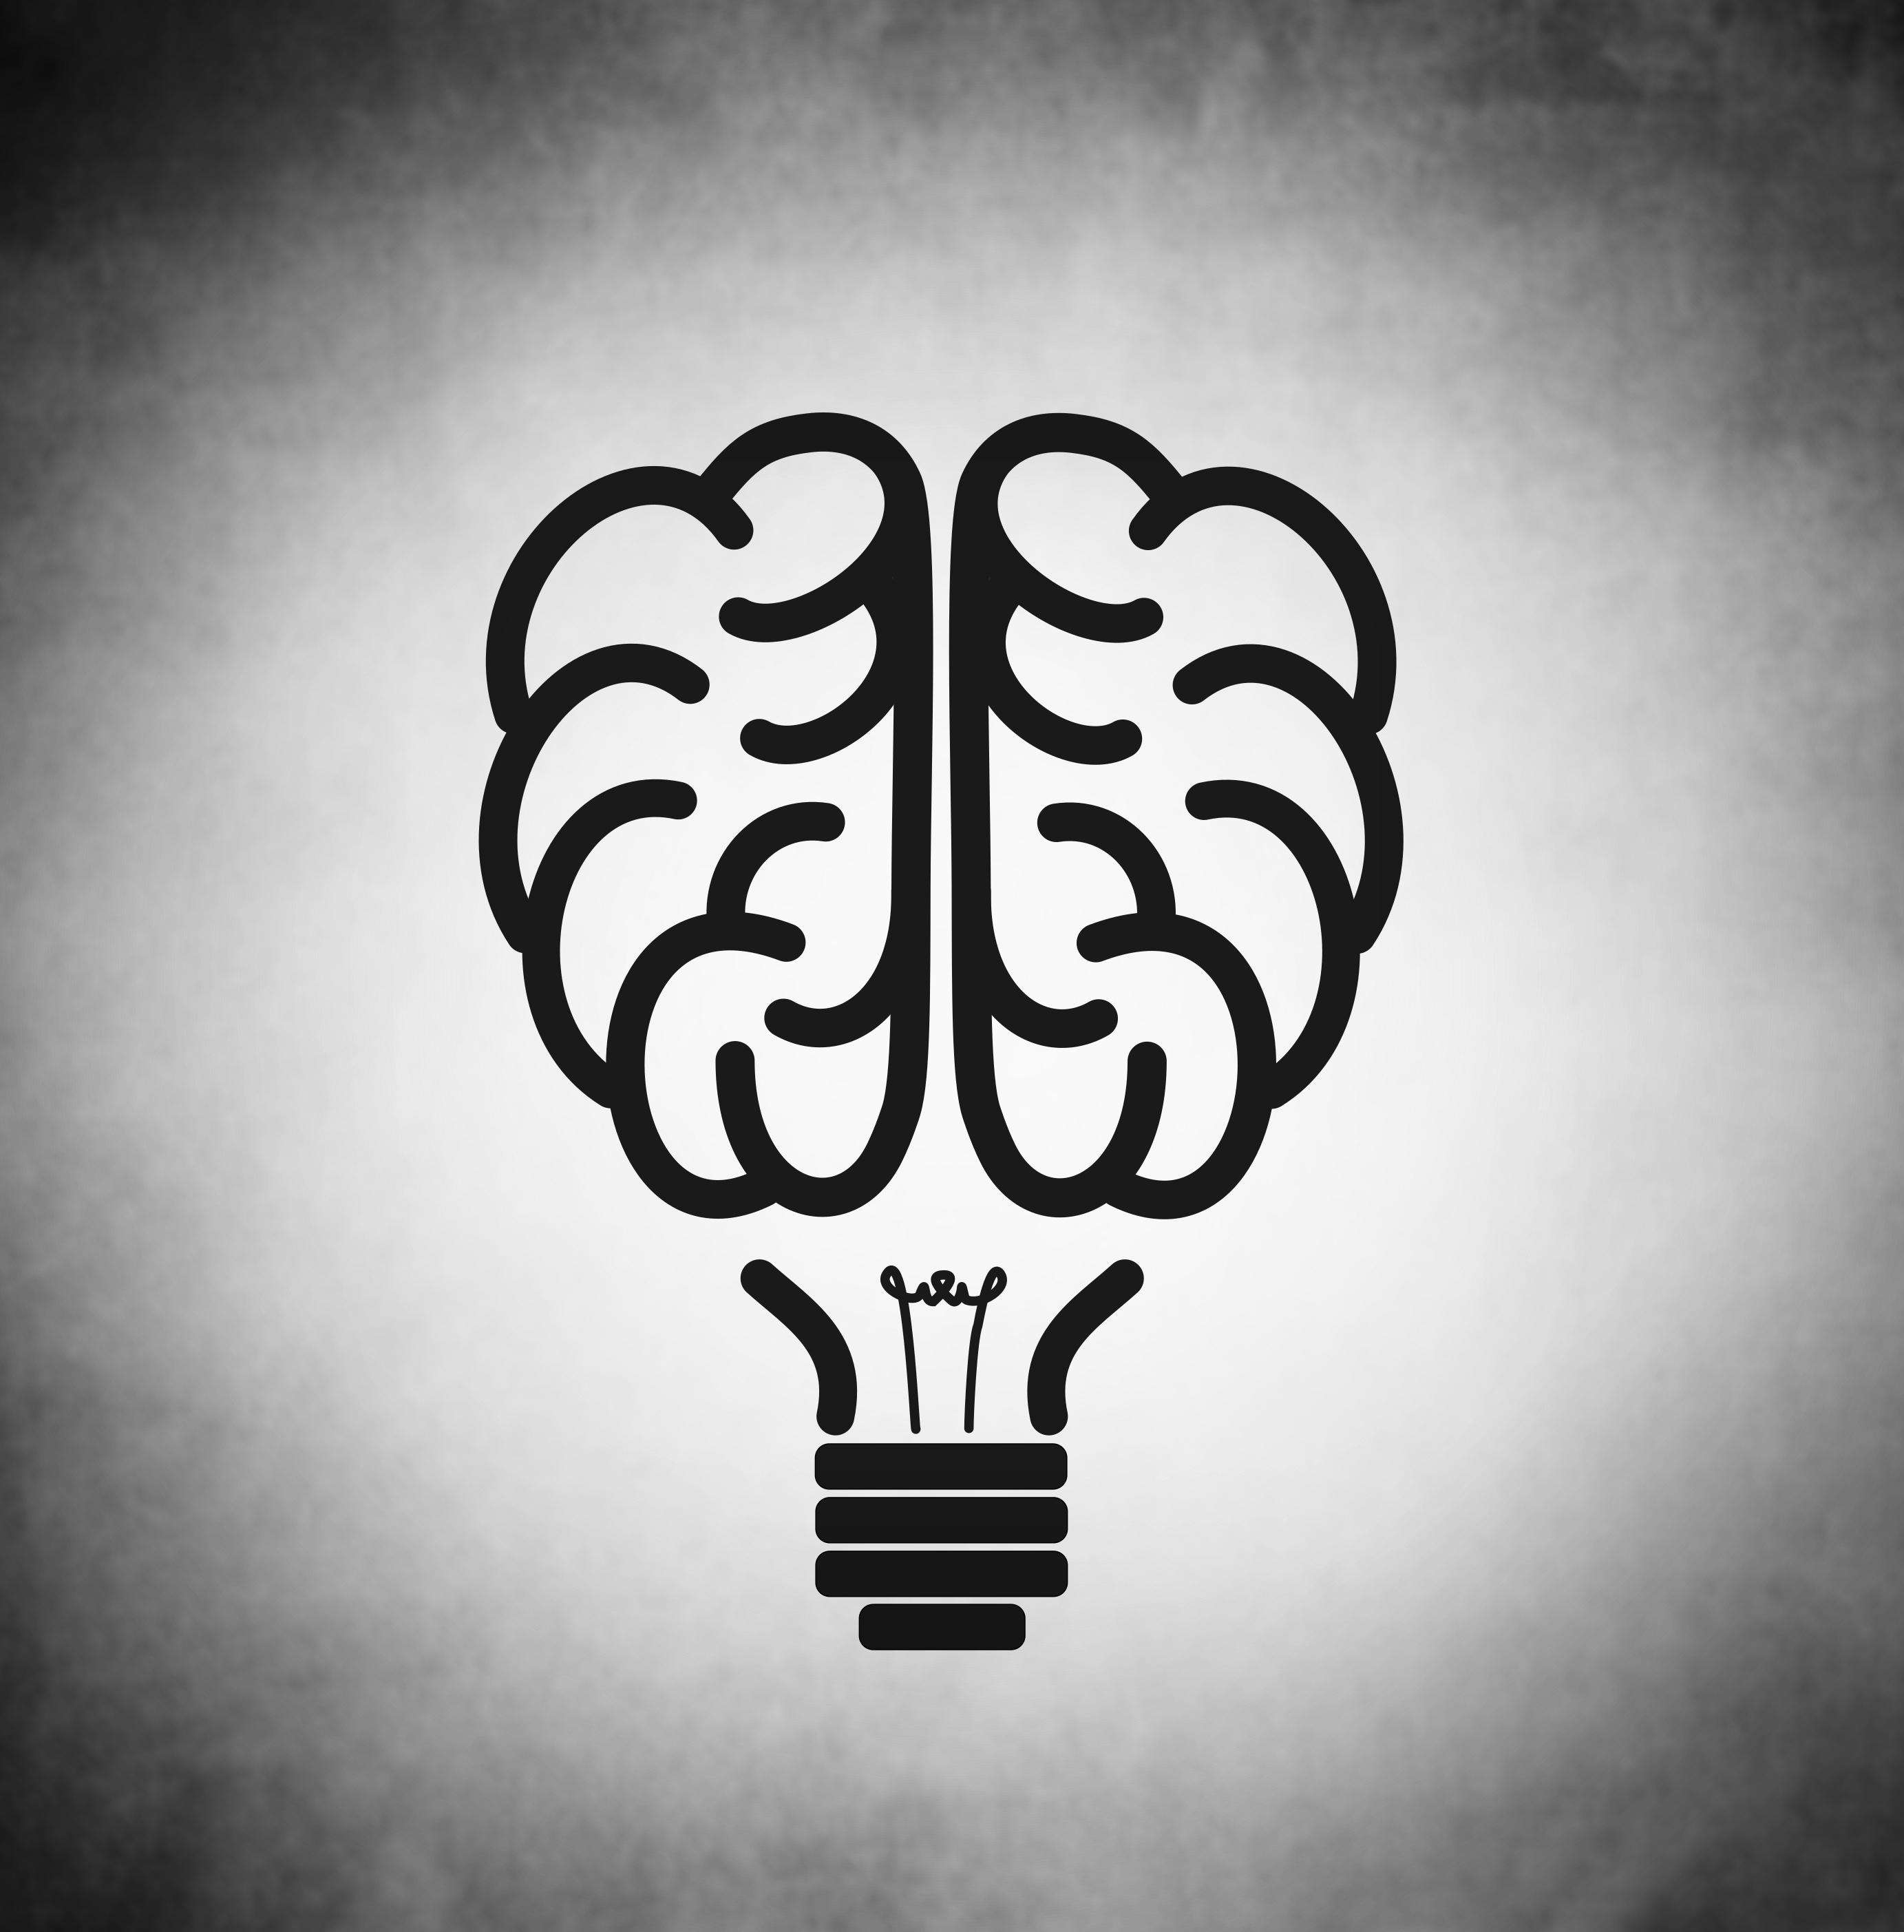 Brain as black lightbulb, Light, Mind, Mental, Medicine, HQ Photo